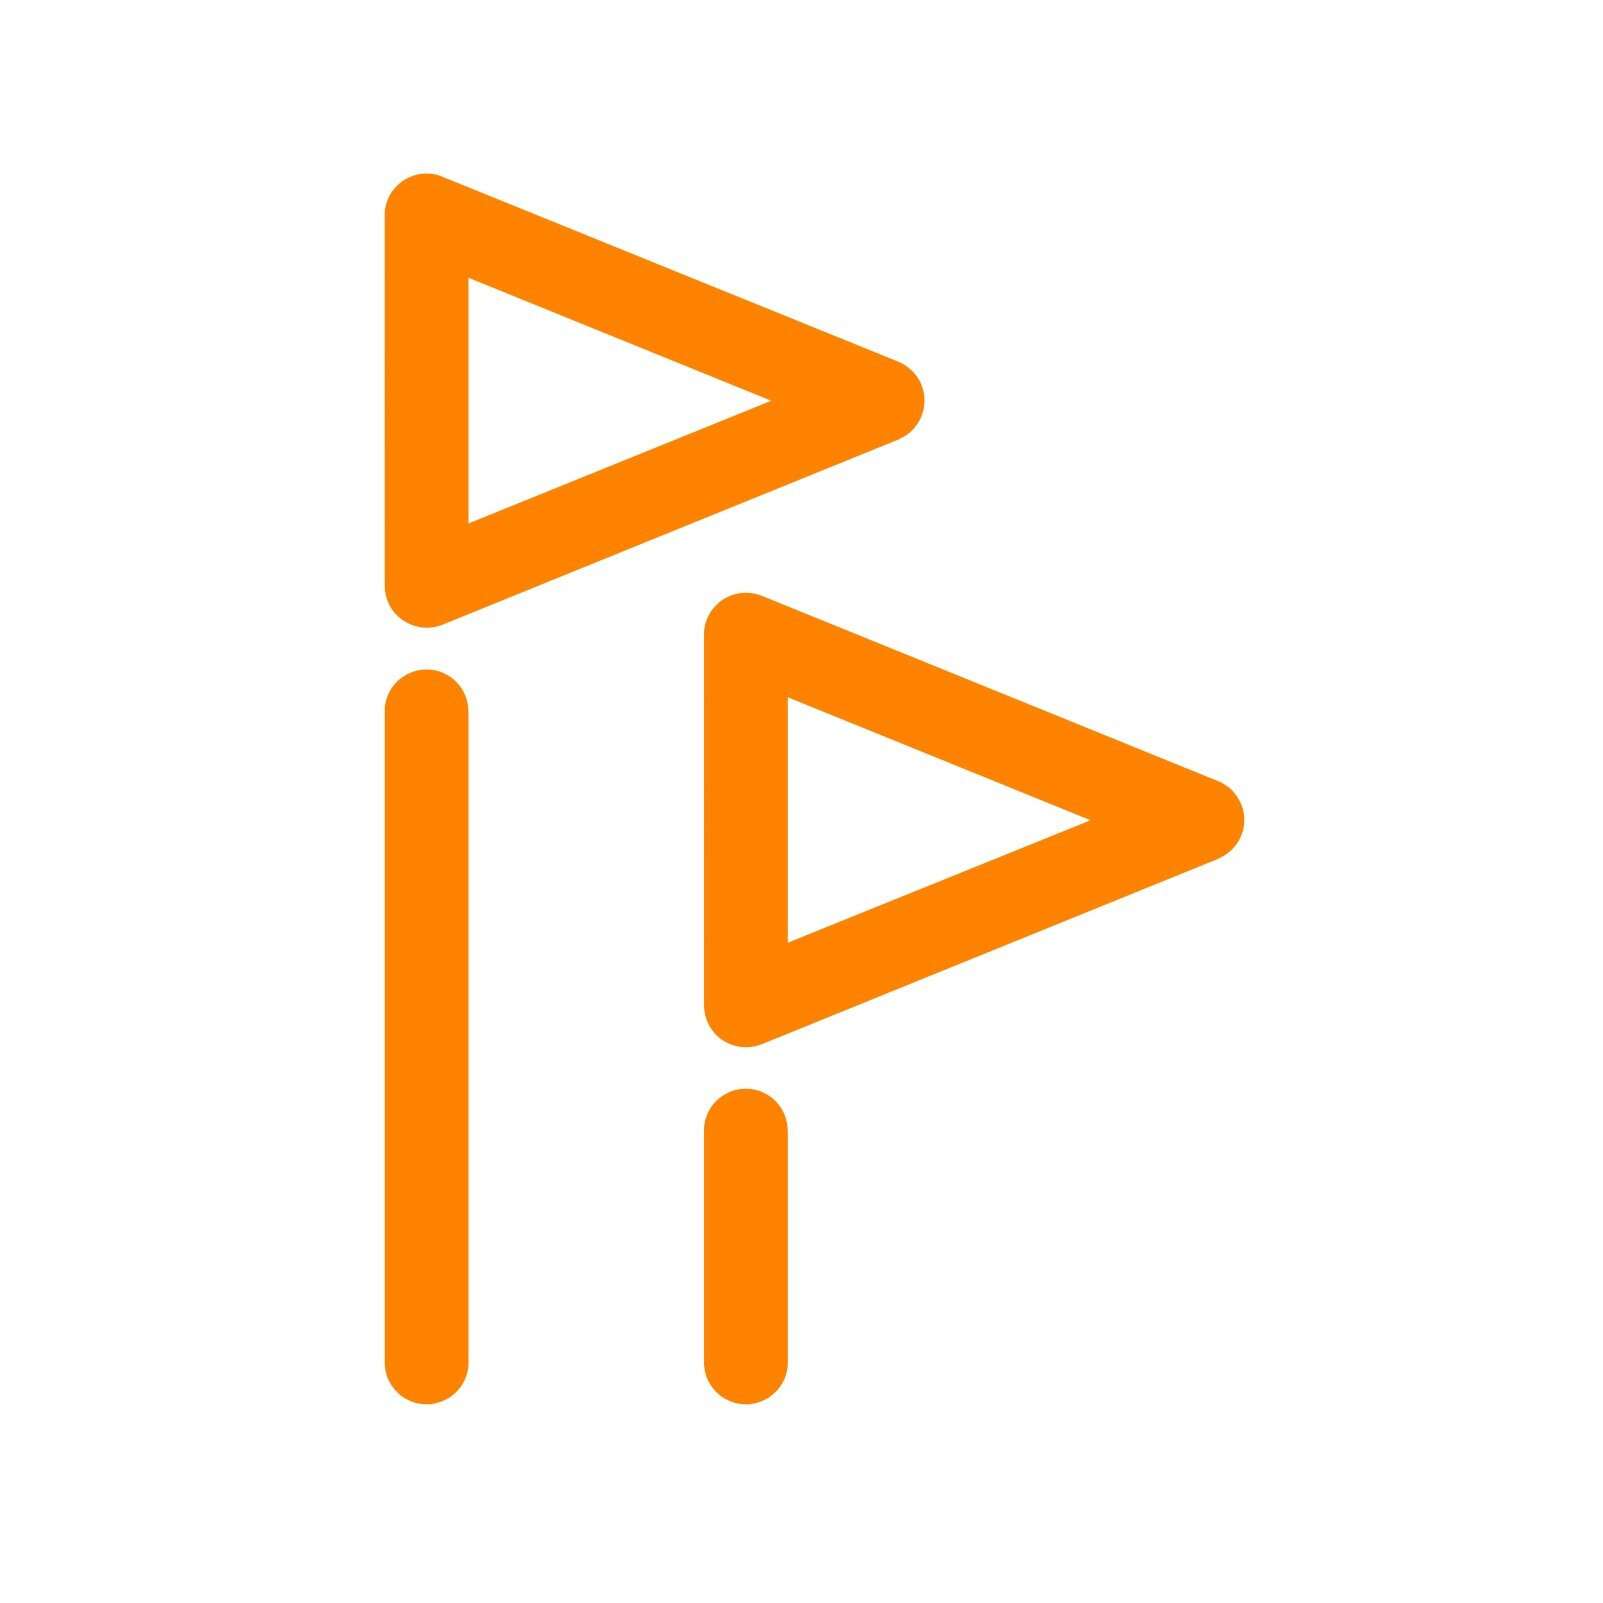 logo+%2861%29.jpg